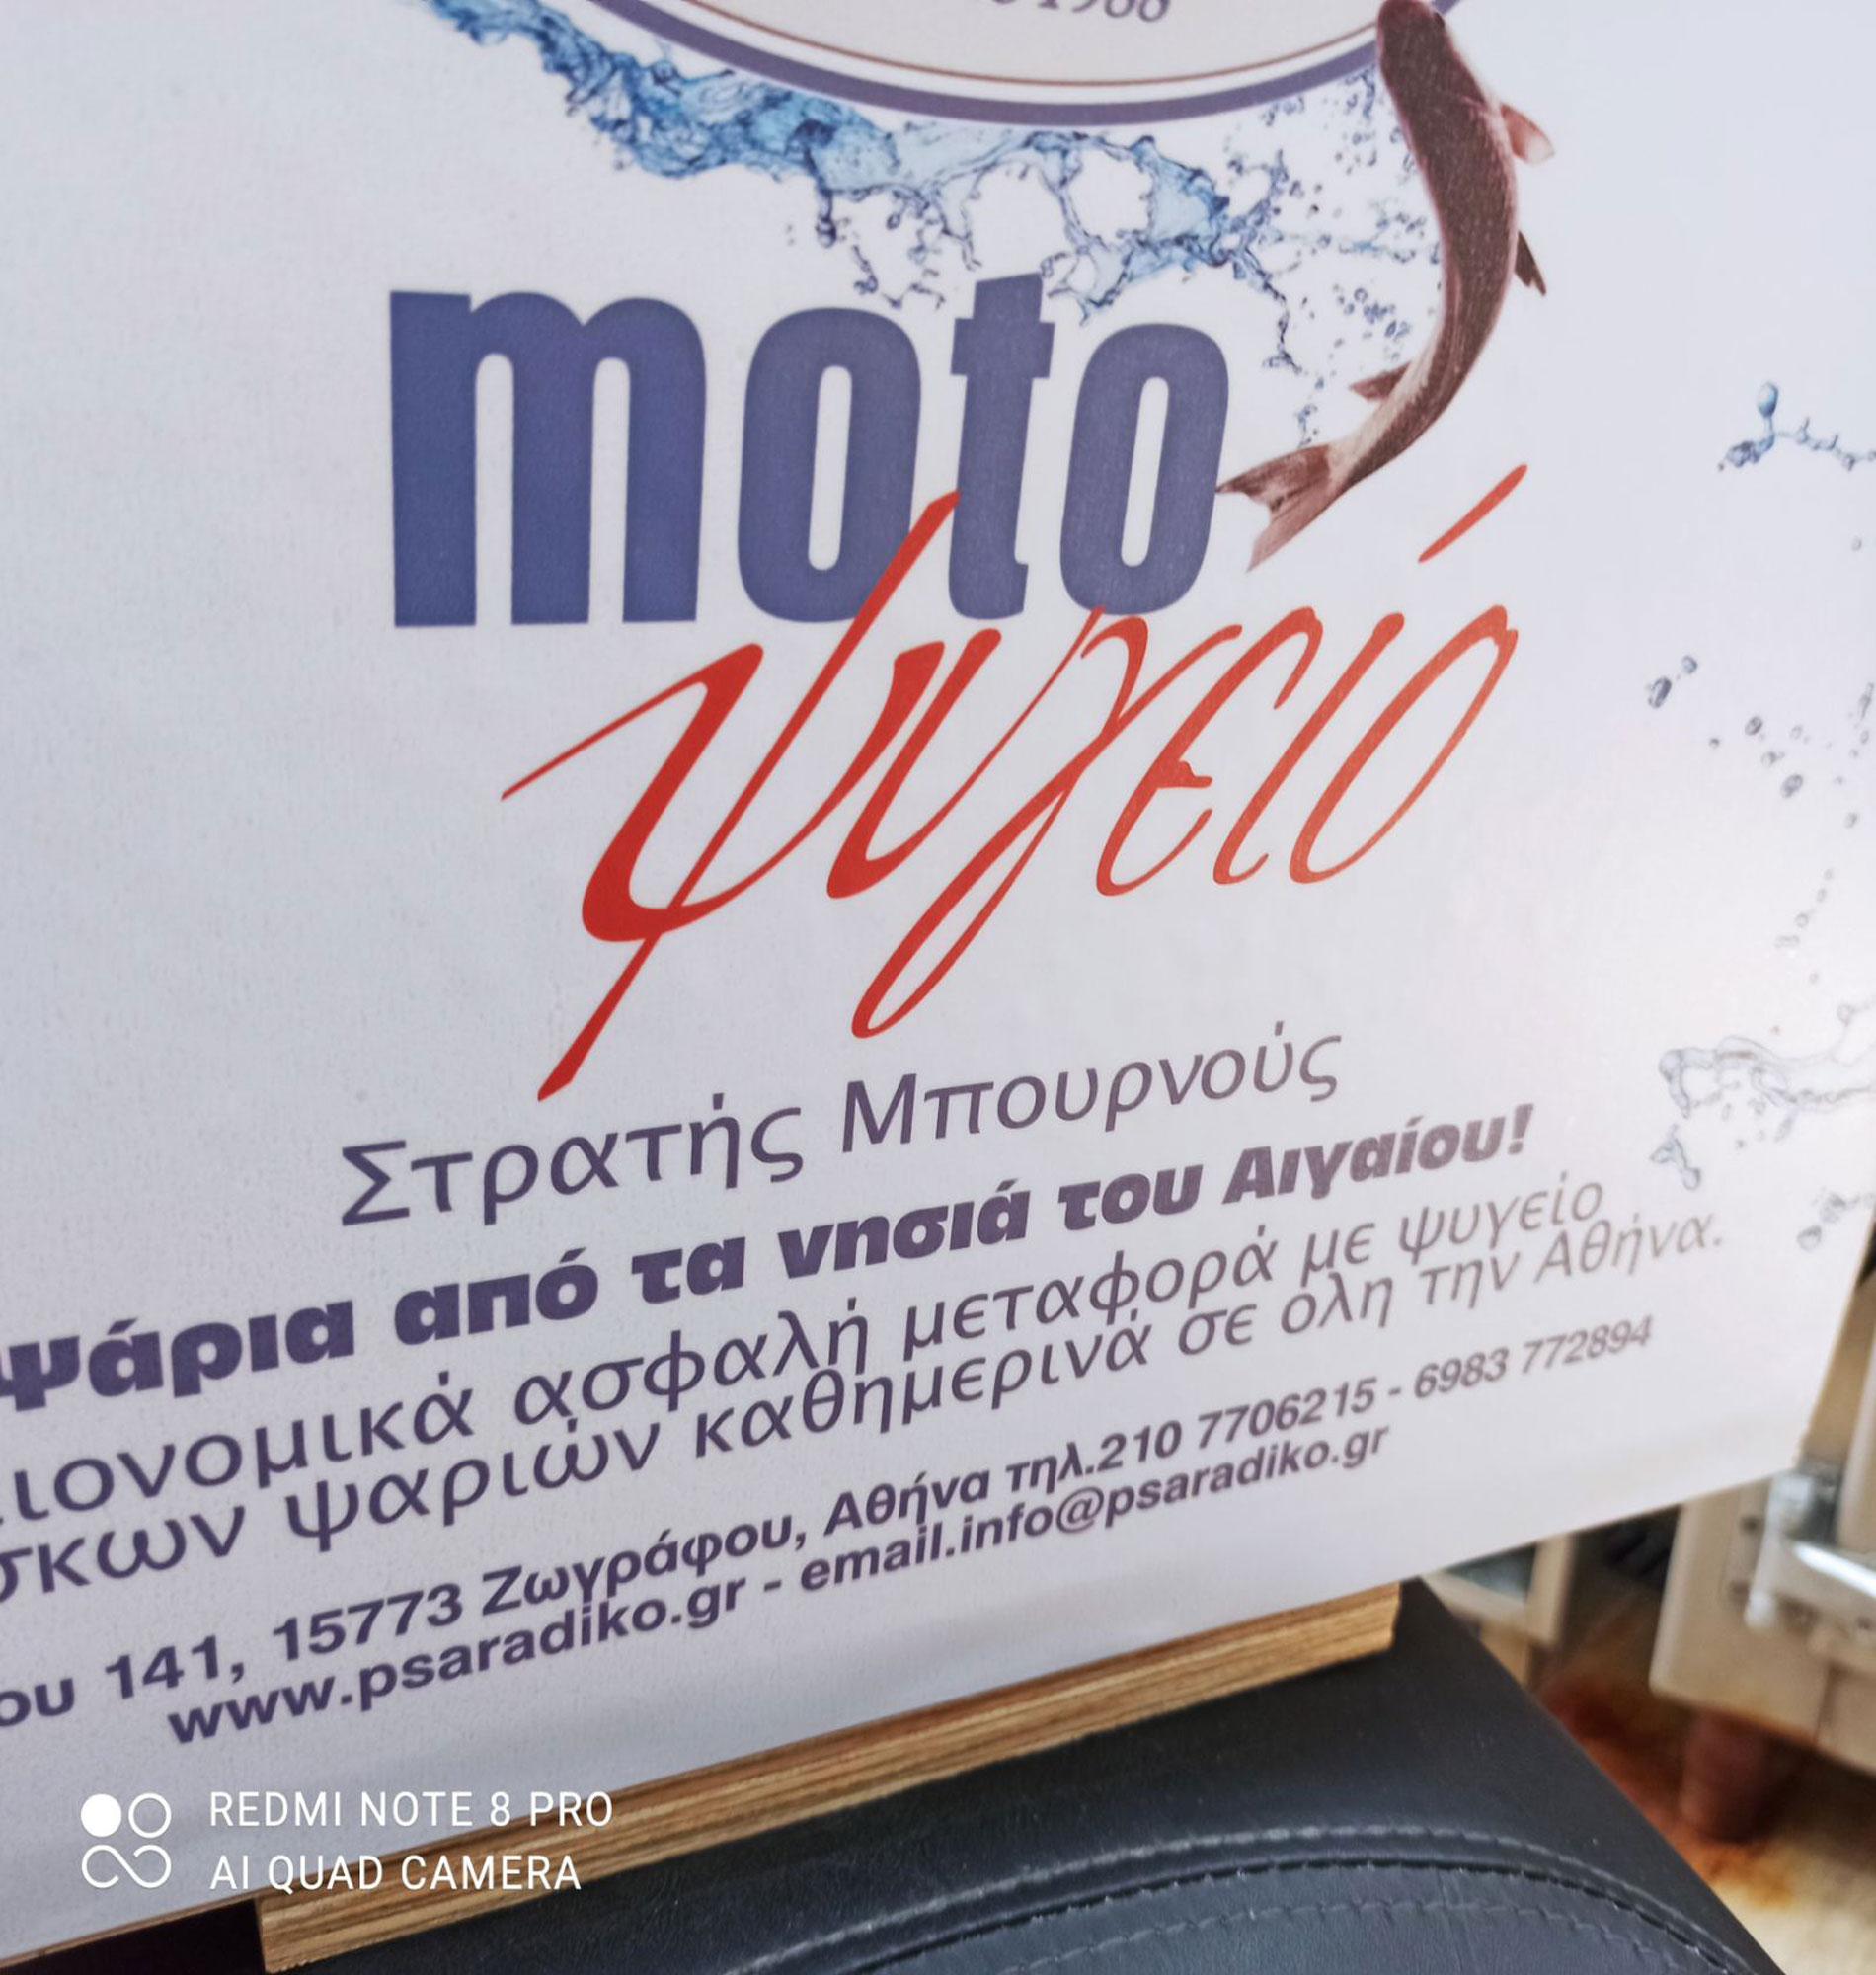 moto-ψυγείο-psaradiko.gr